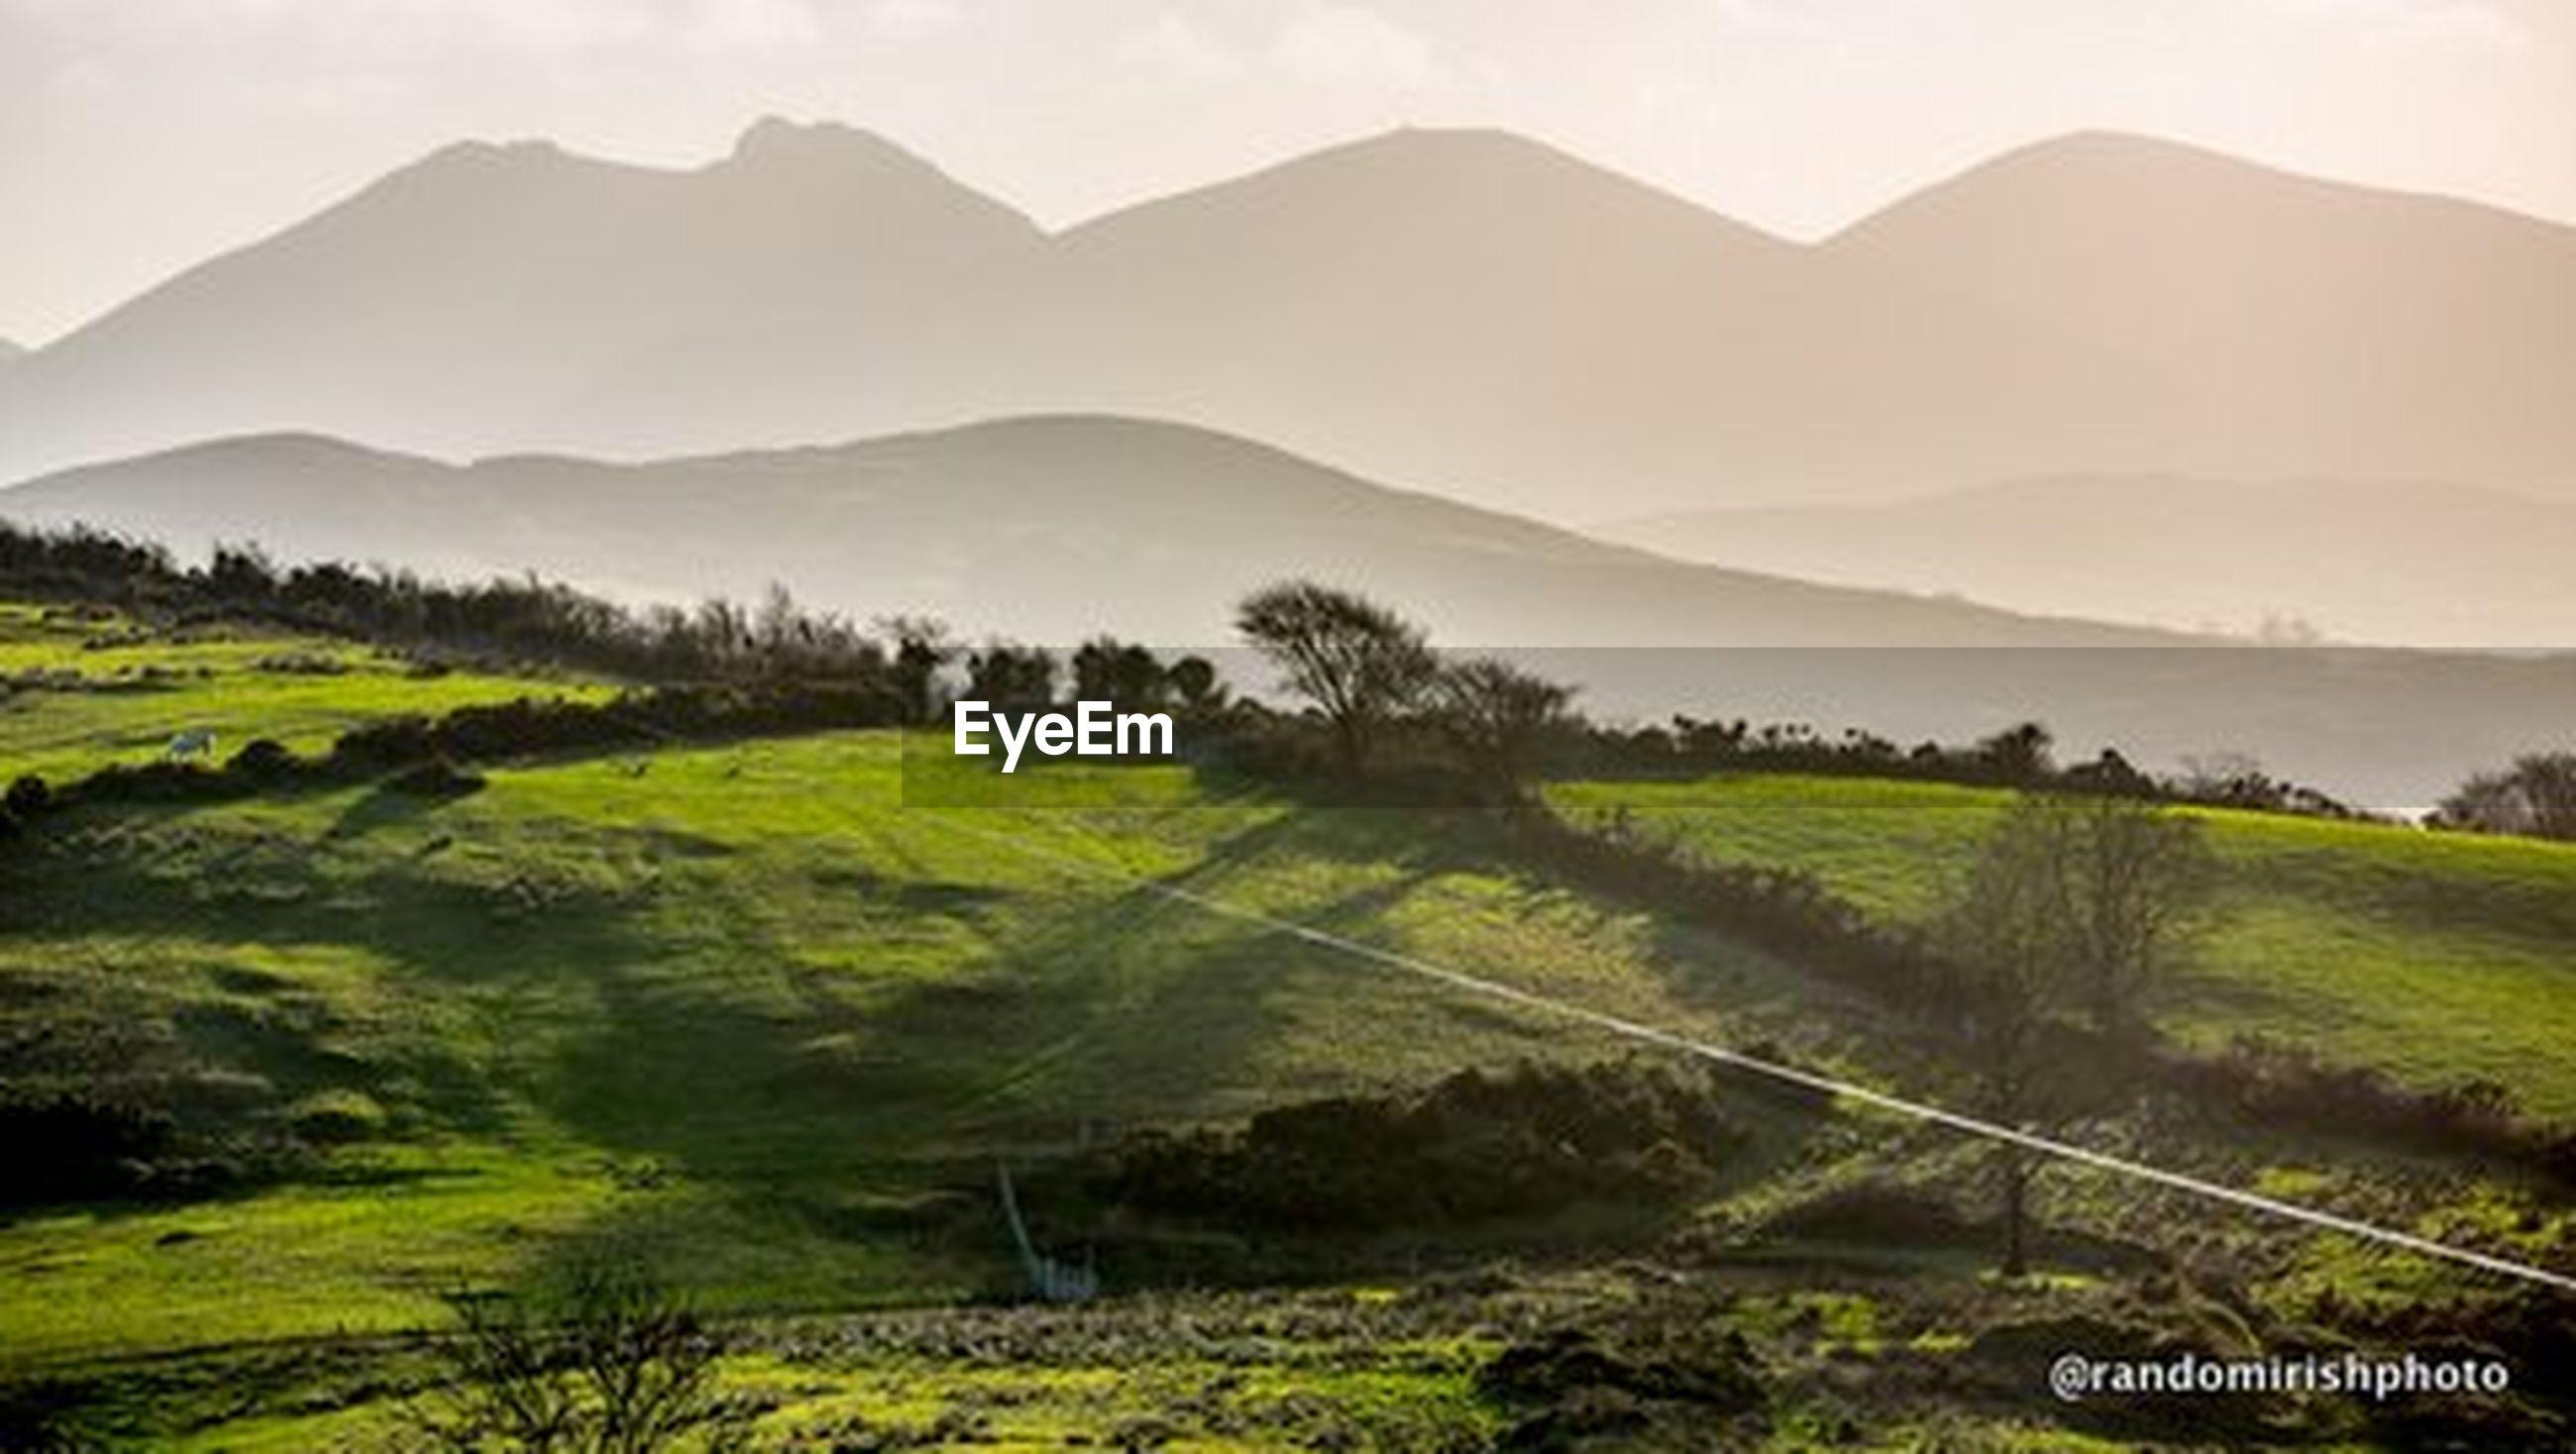 mountain, landscape, tranquil scene, tranquility, scenics, mountain range, beauty in nature, tree, rural scene, nature, field, agriculture, green color, non-urban scene, high angle view, farm, grass, idyllic, sky, remote